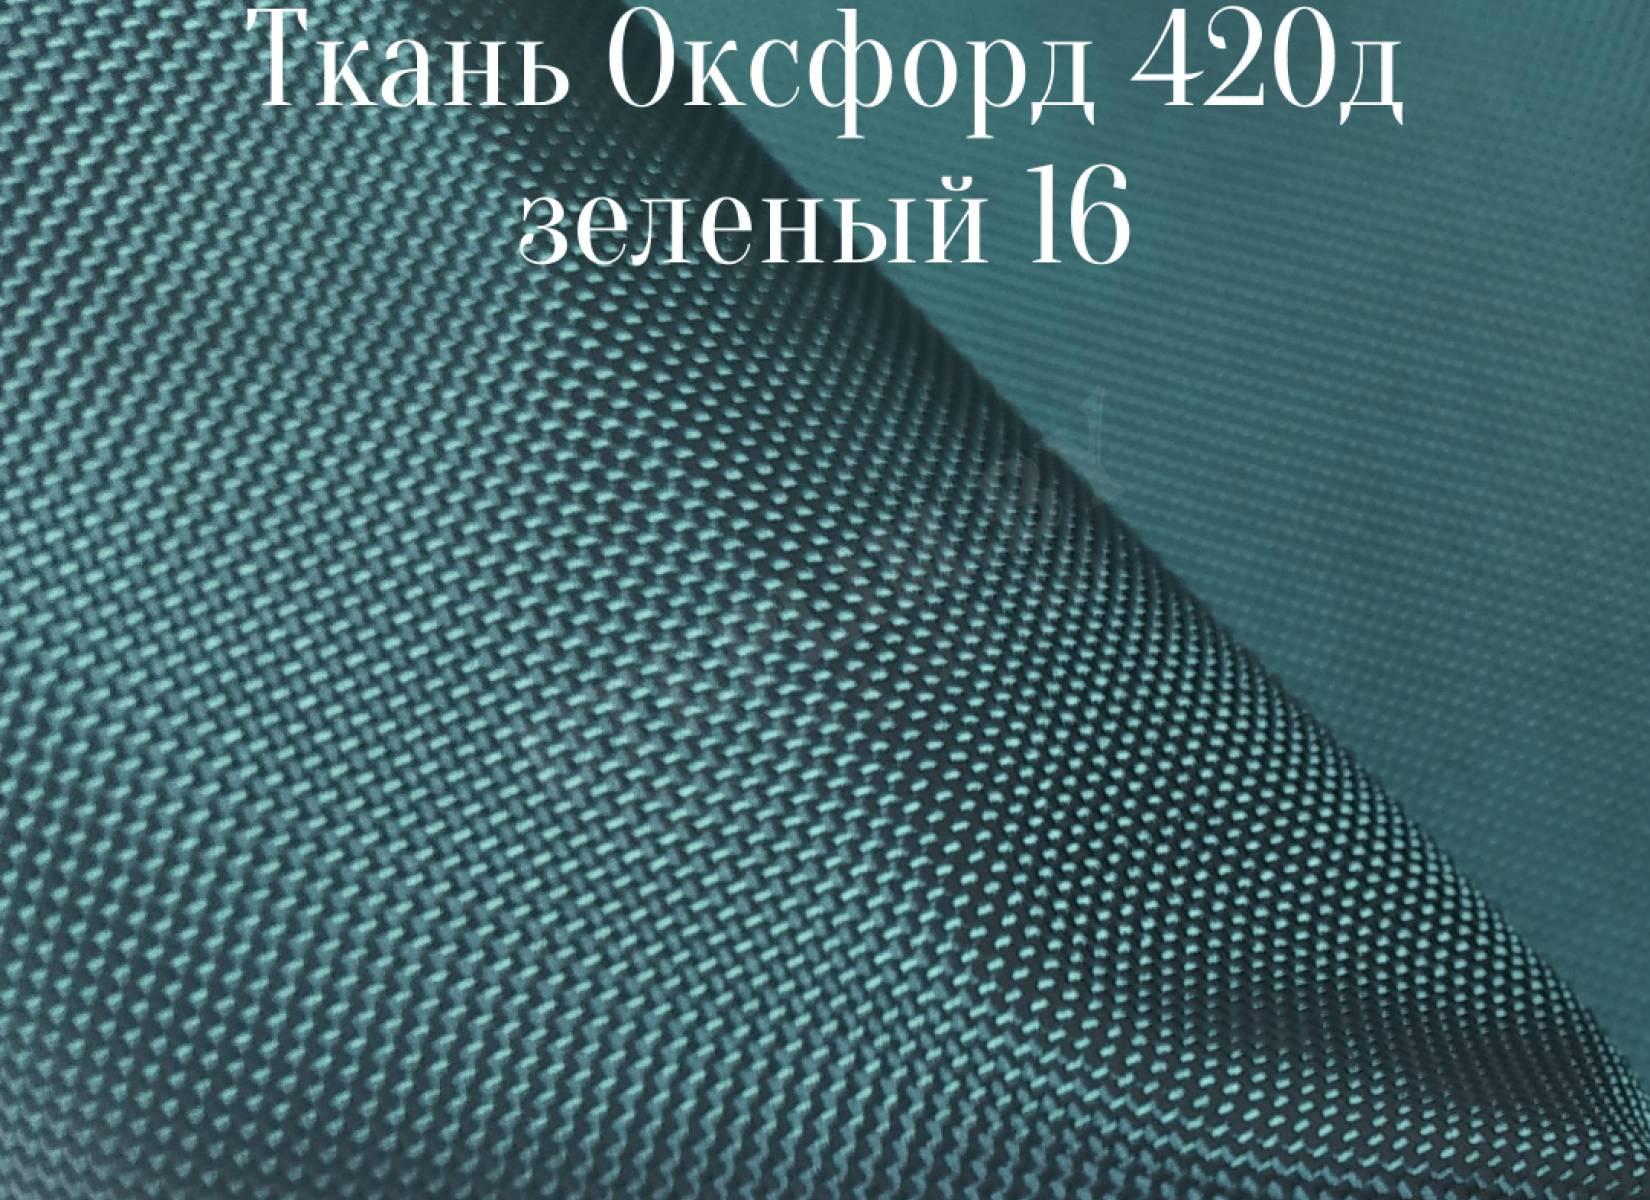 420д ПУ - зеленый 16